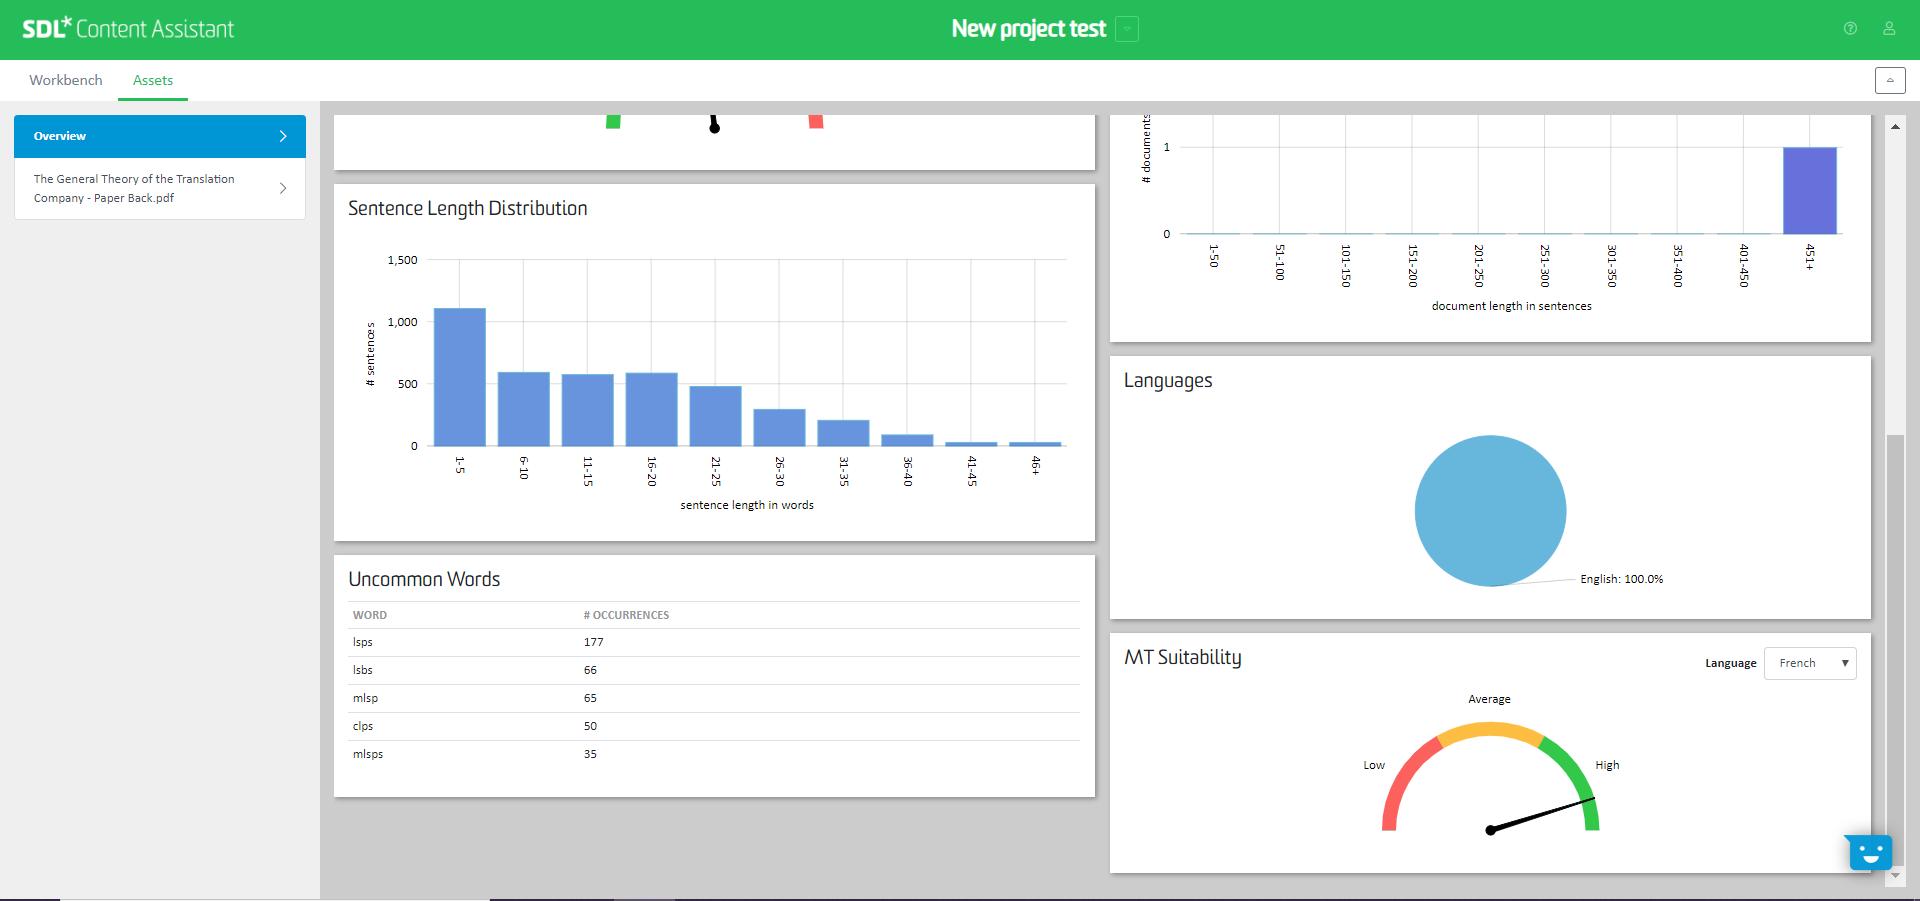 Nimdzi Analyzes the SDL Content Assistant Tool 03